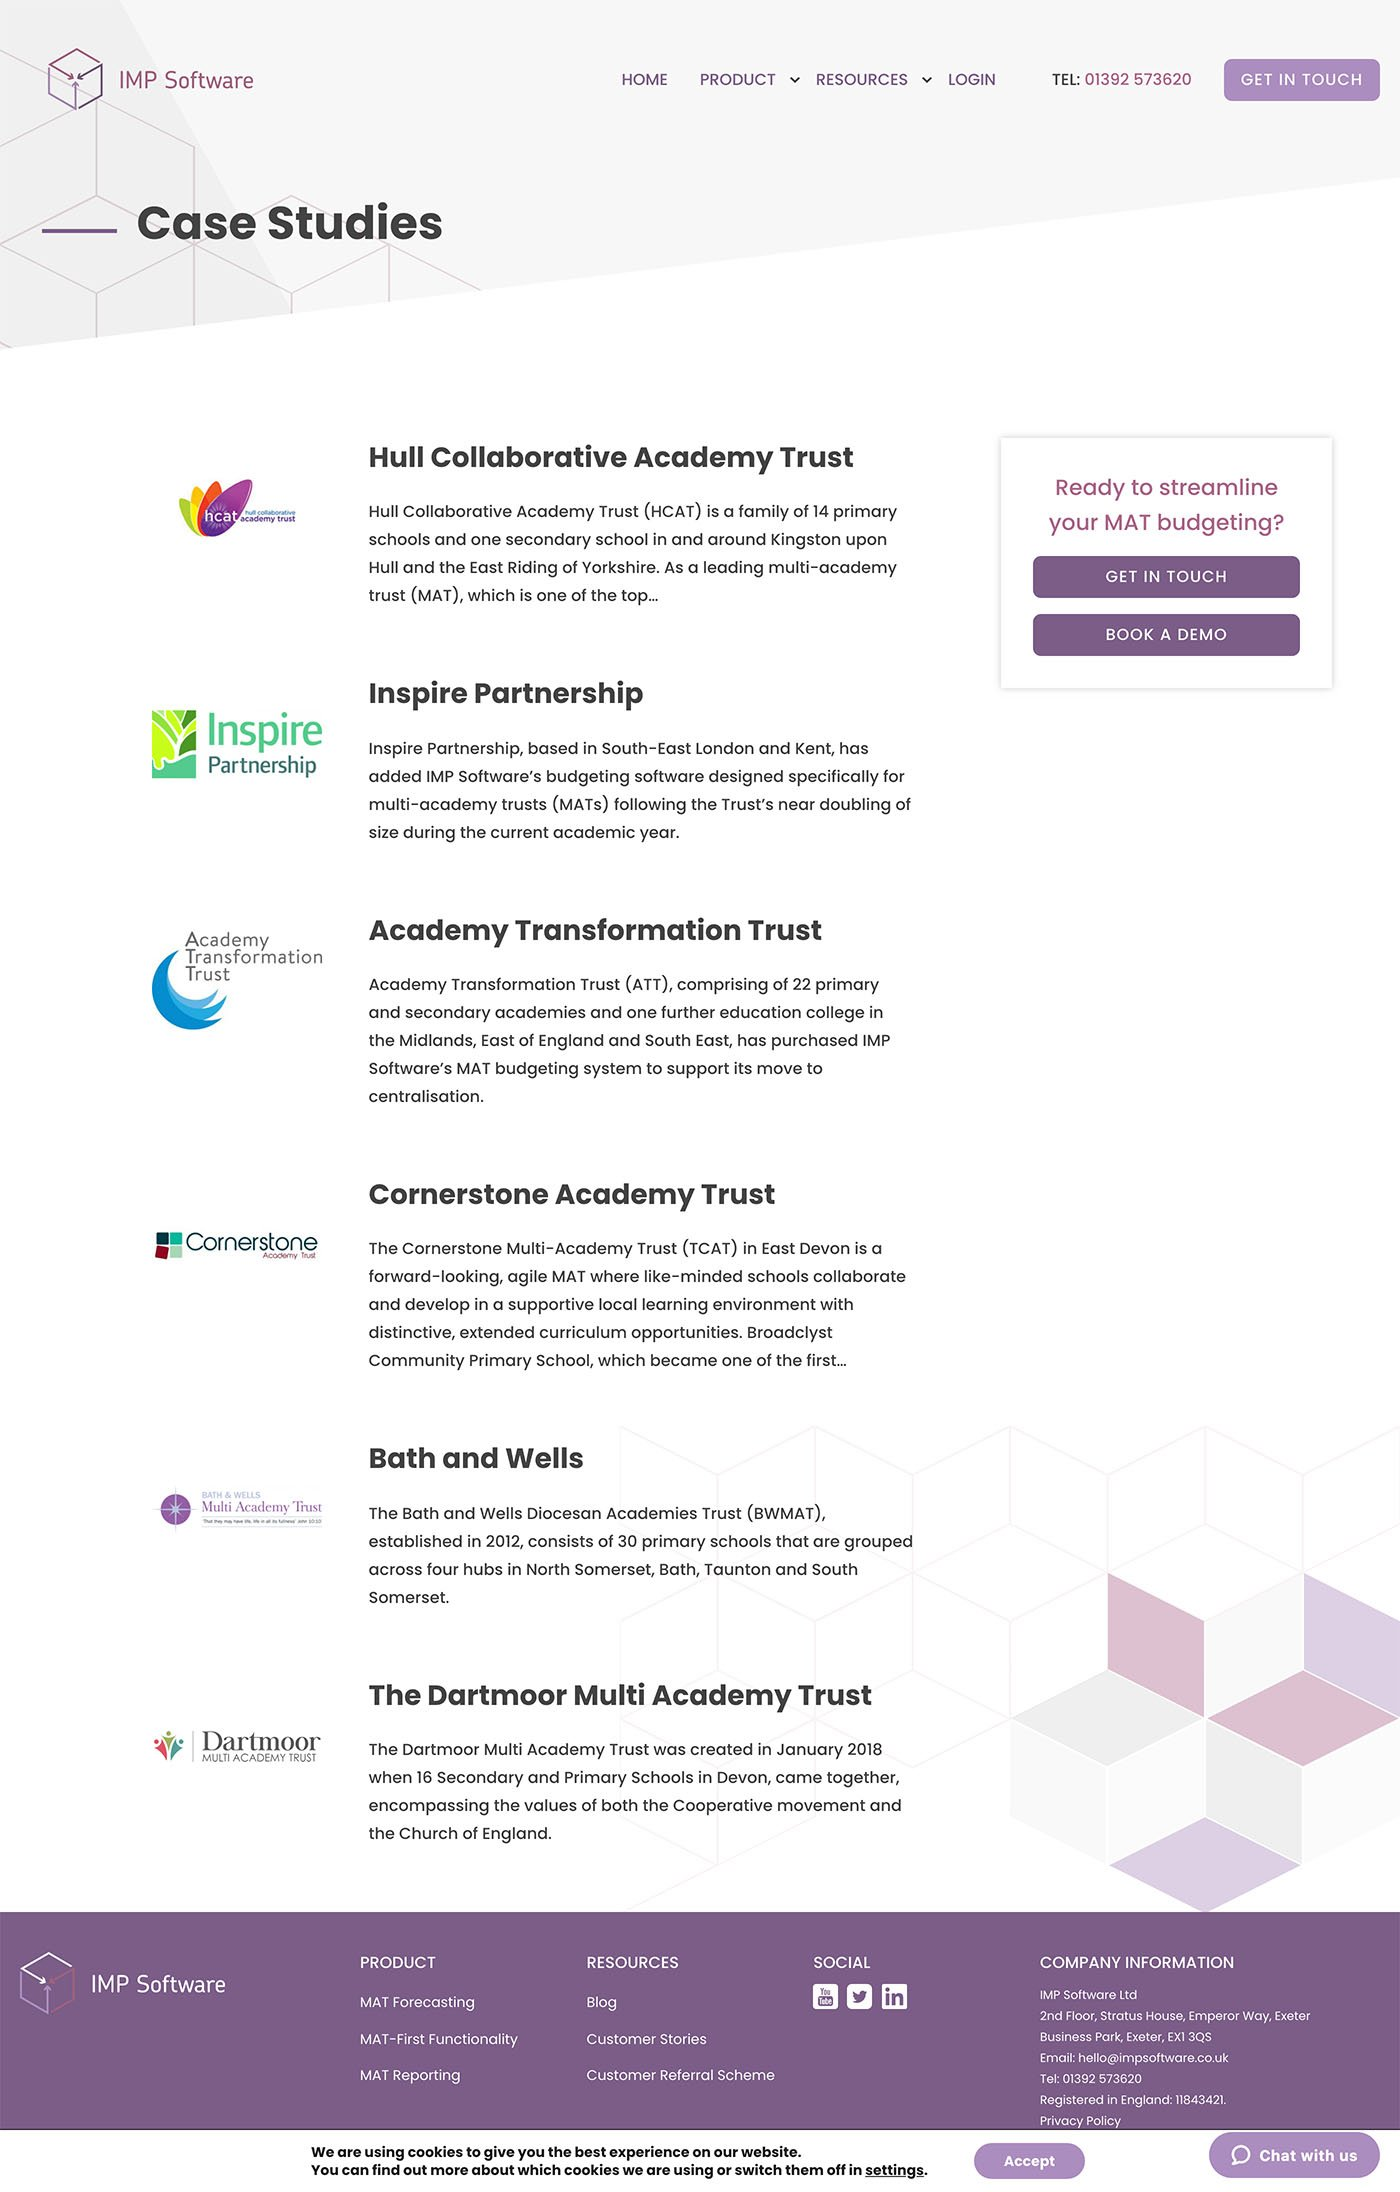 IMP Software case study